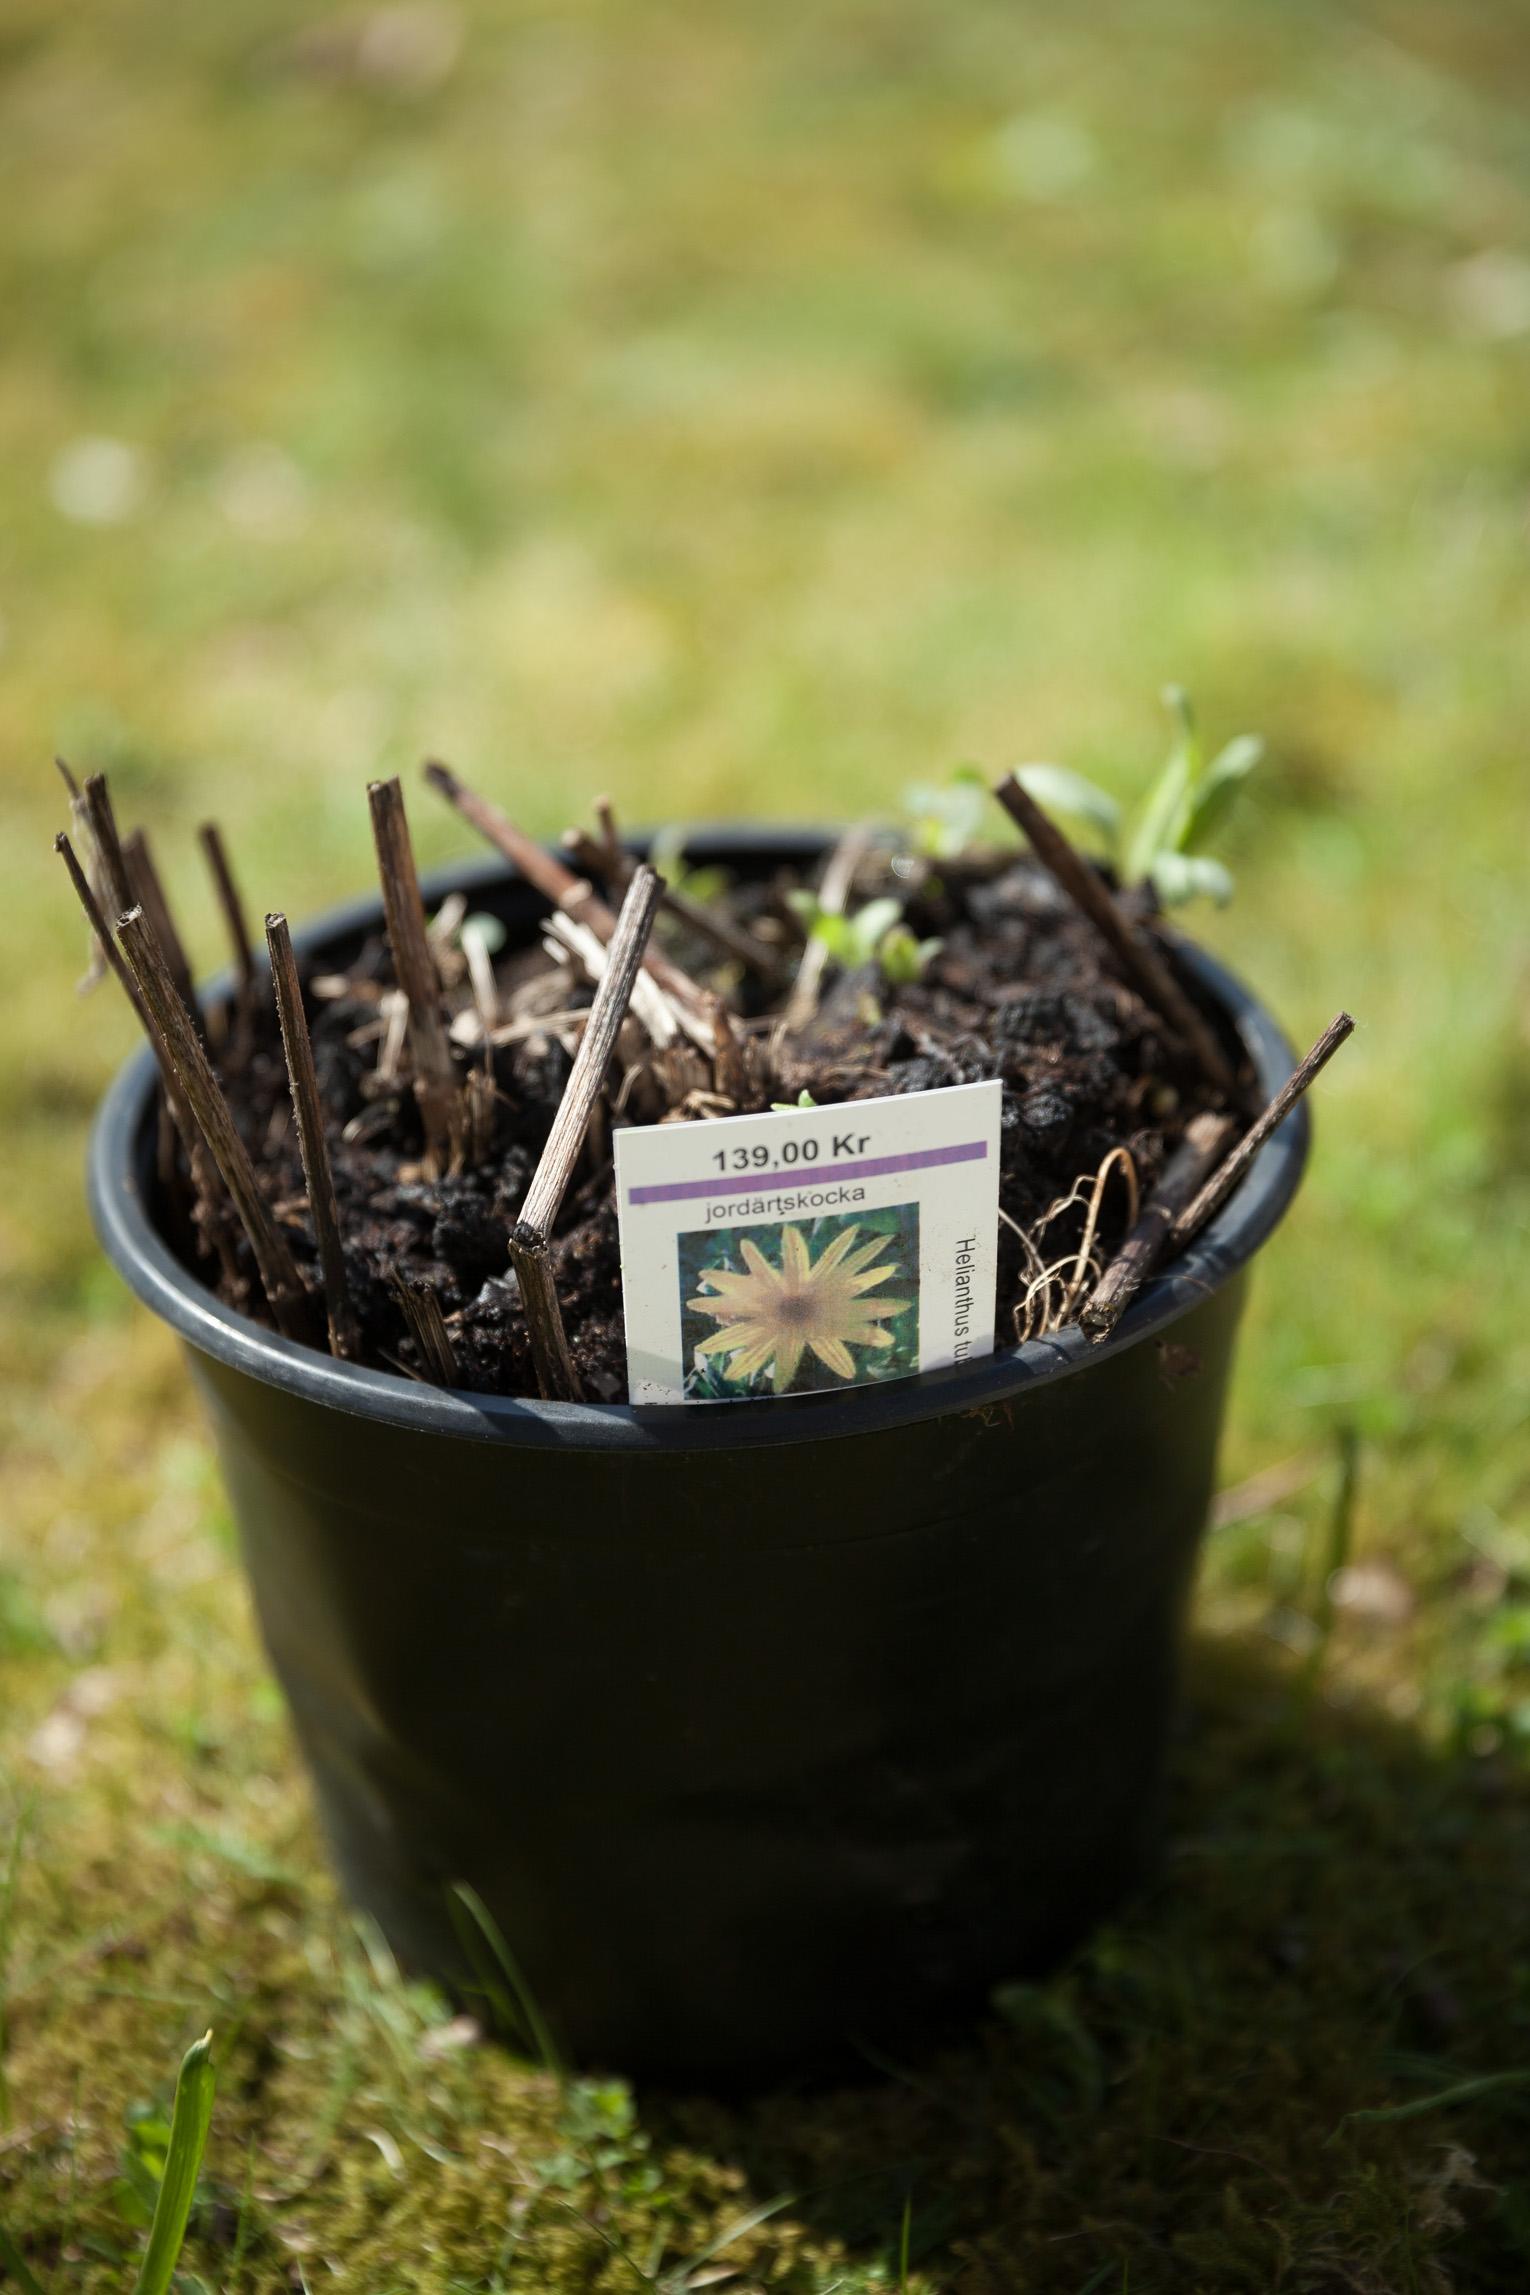 jordärtskockor planta